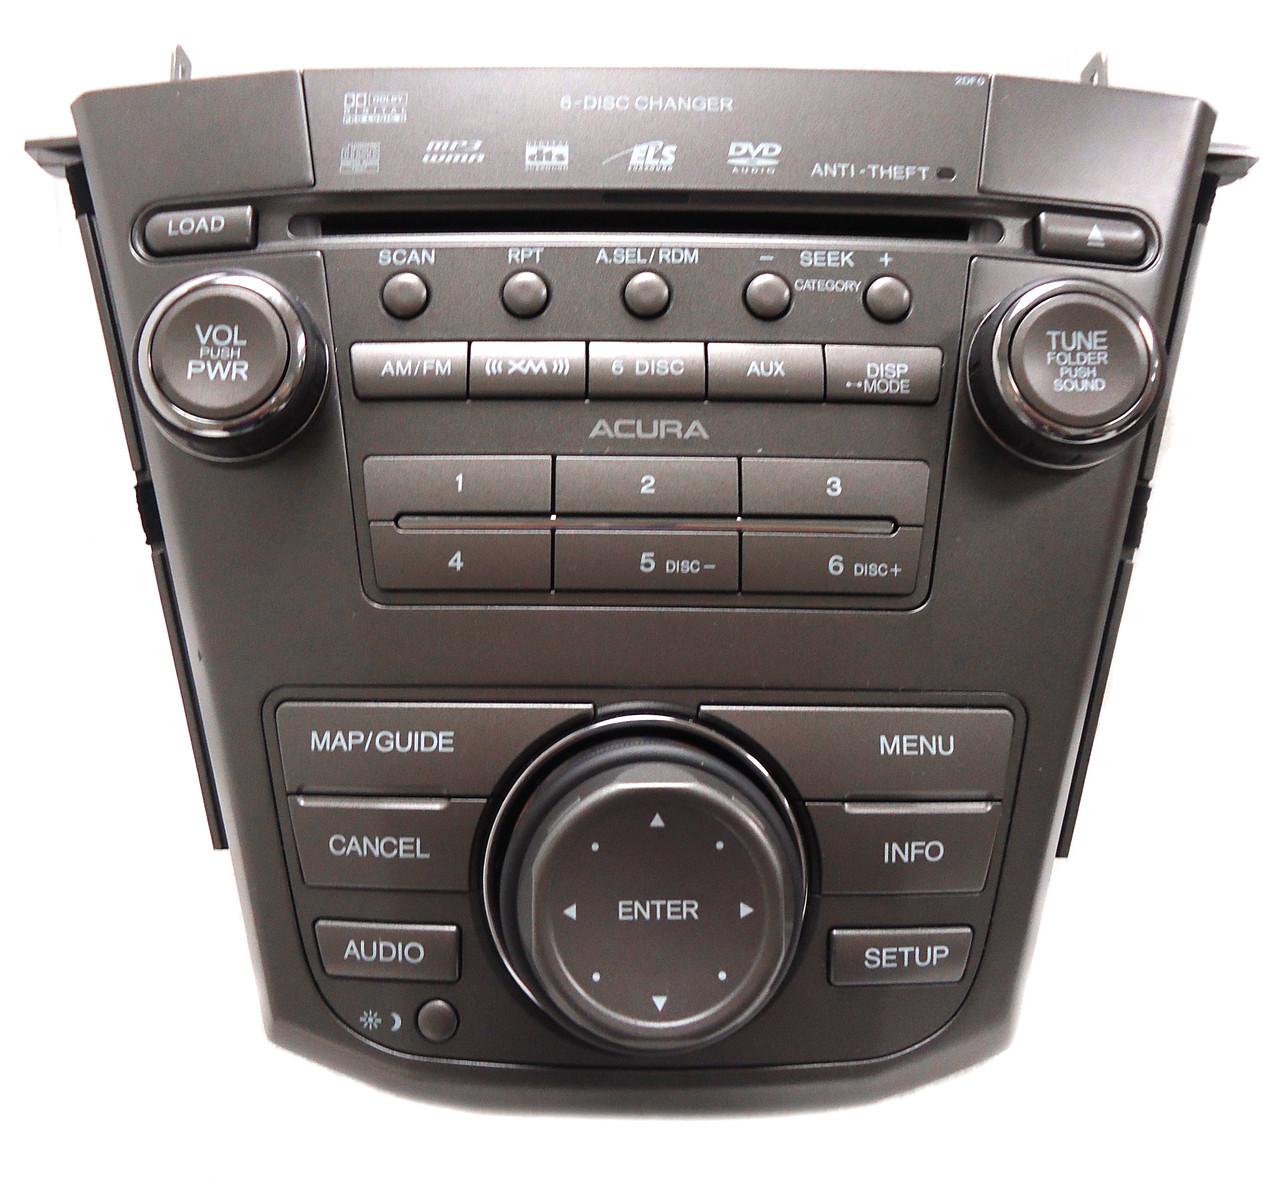 ACURA MDX Navigation 2DF0 Radio 6 Disc Changer CD DVD